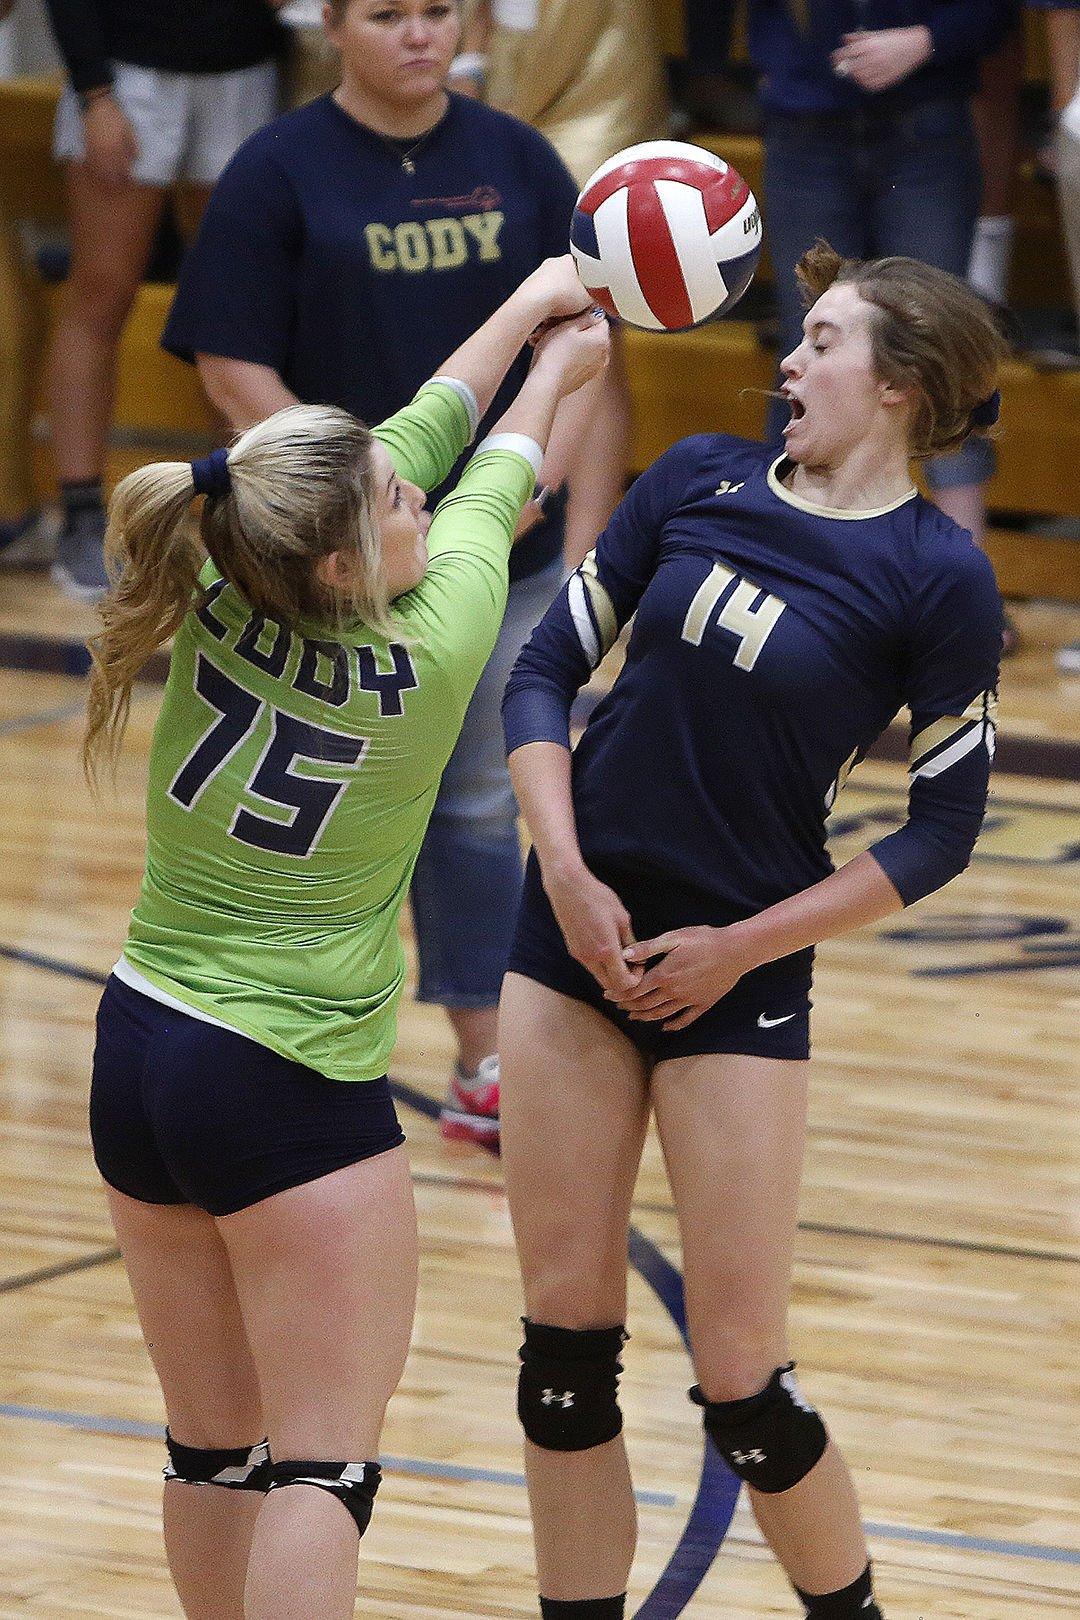 Cody volleyball